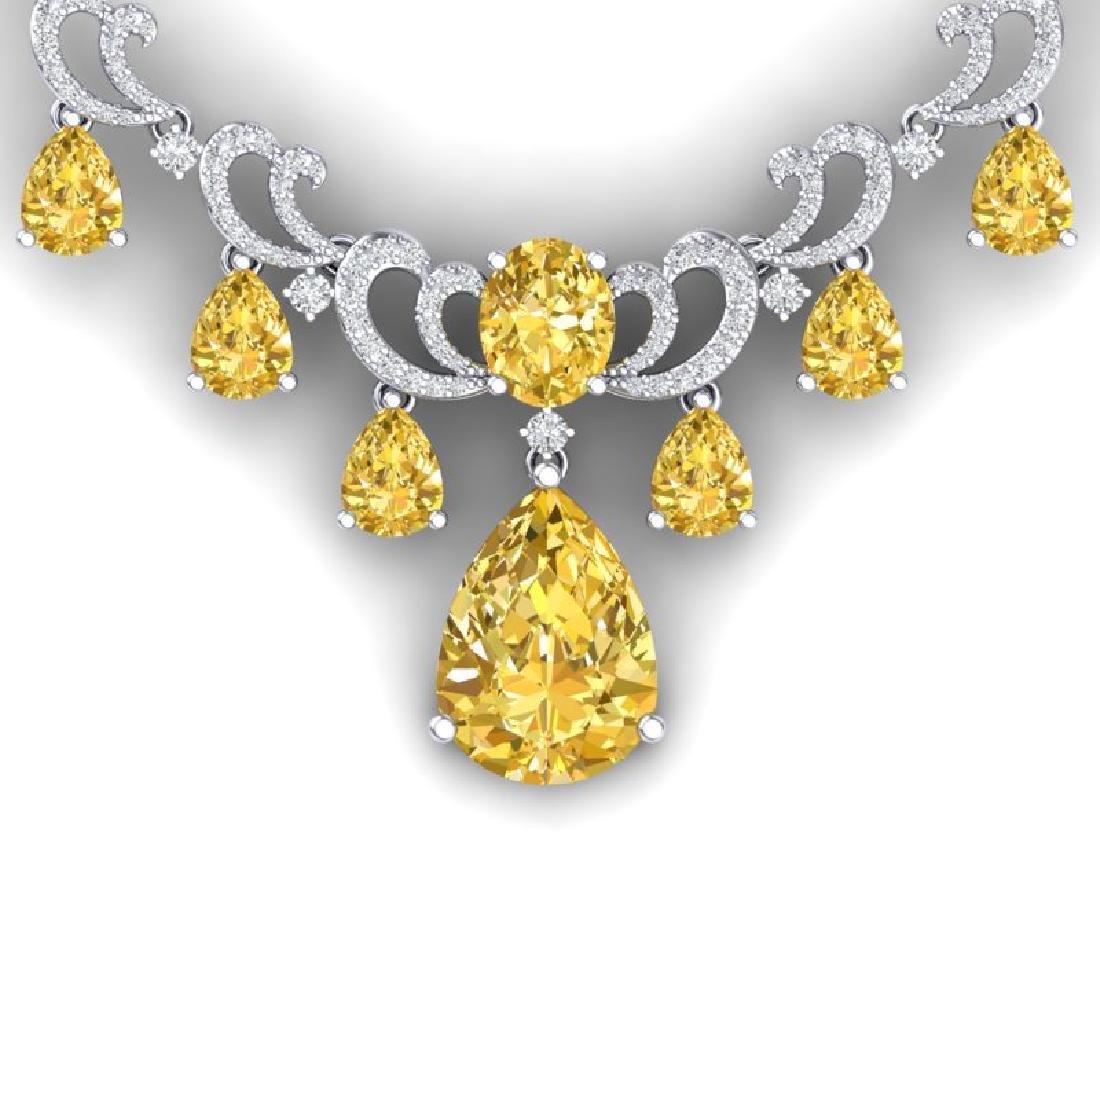 33.38 CTW Royalty Canary Citrine & VS Diamond Necklace